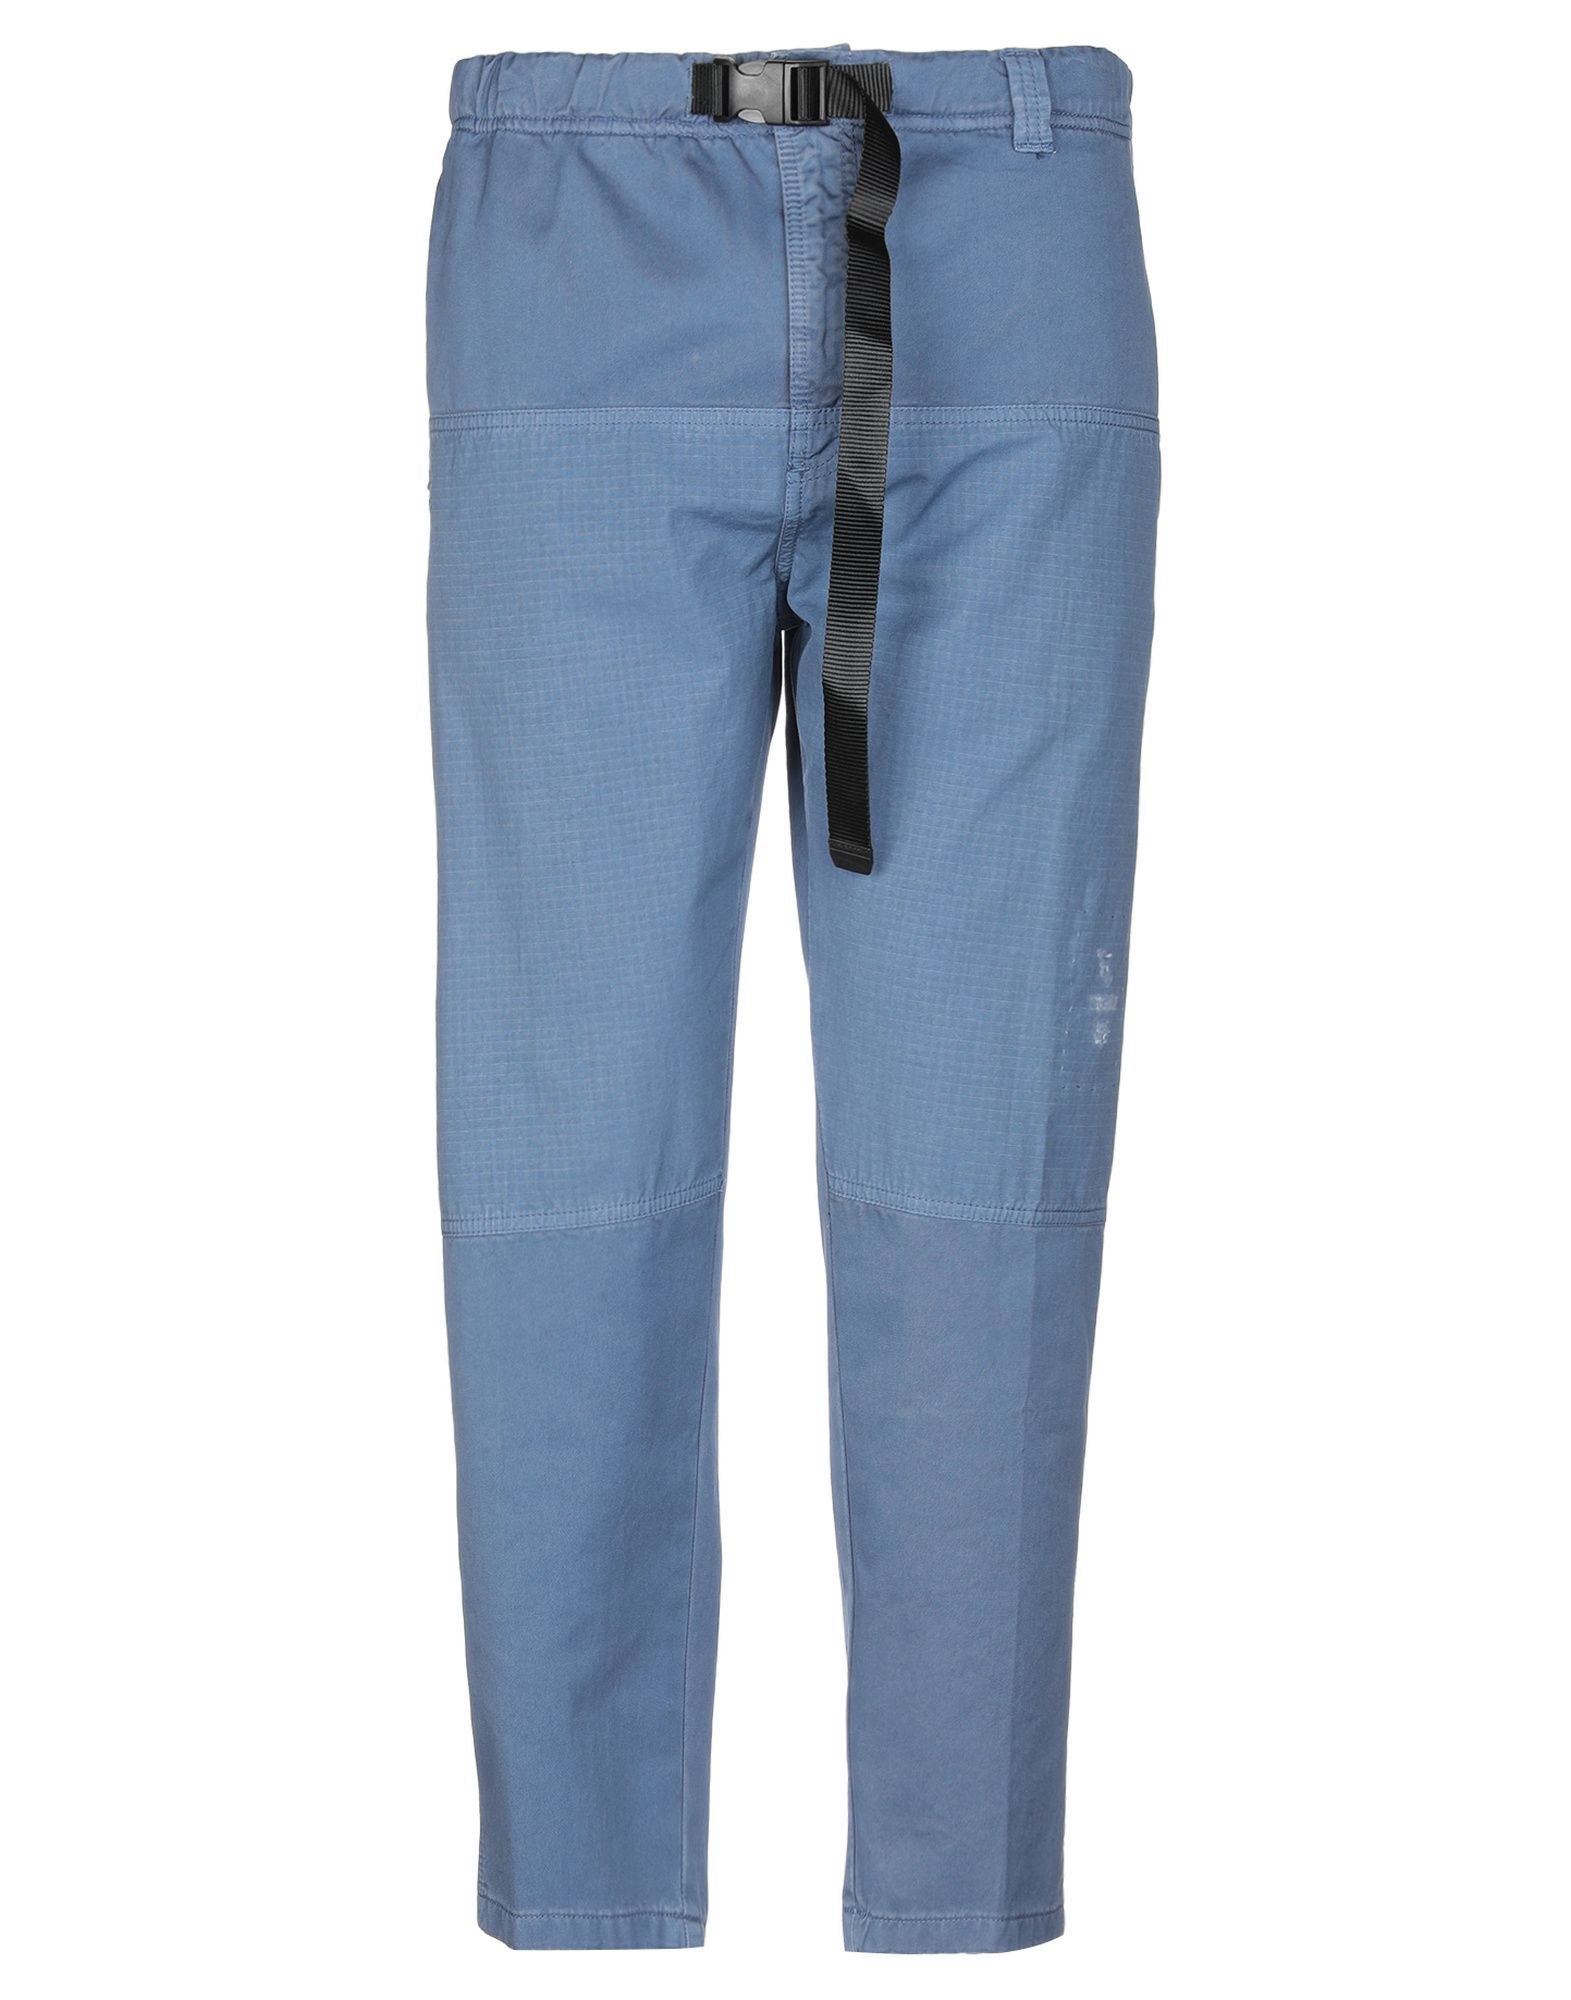 Siviglia White Slate Blue Cotton Tapered Leg Chino Trousers